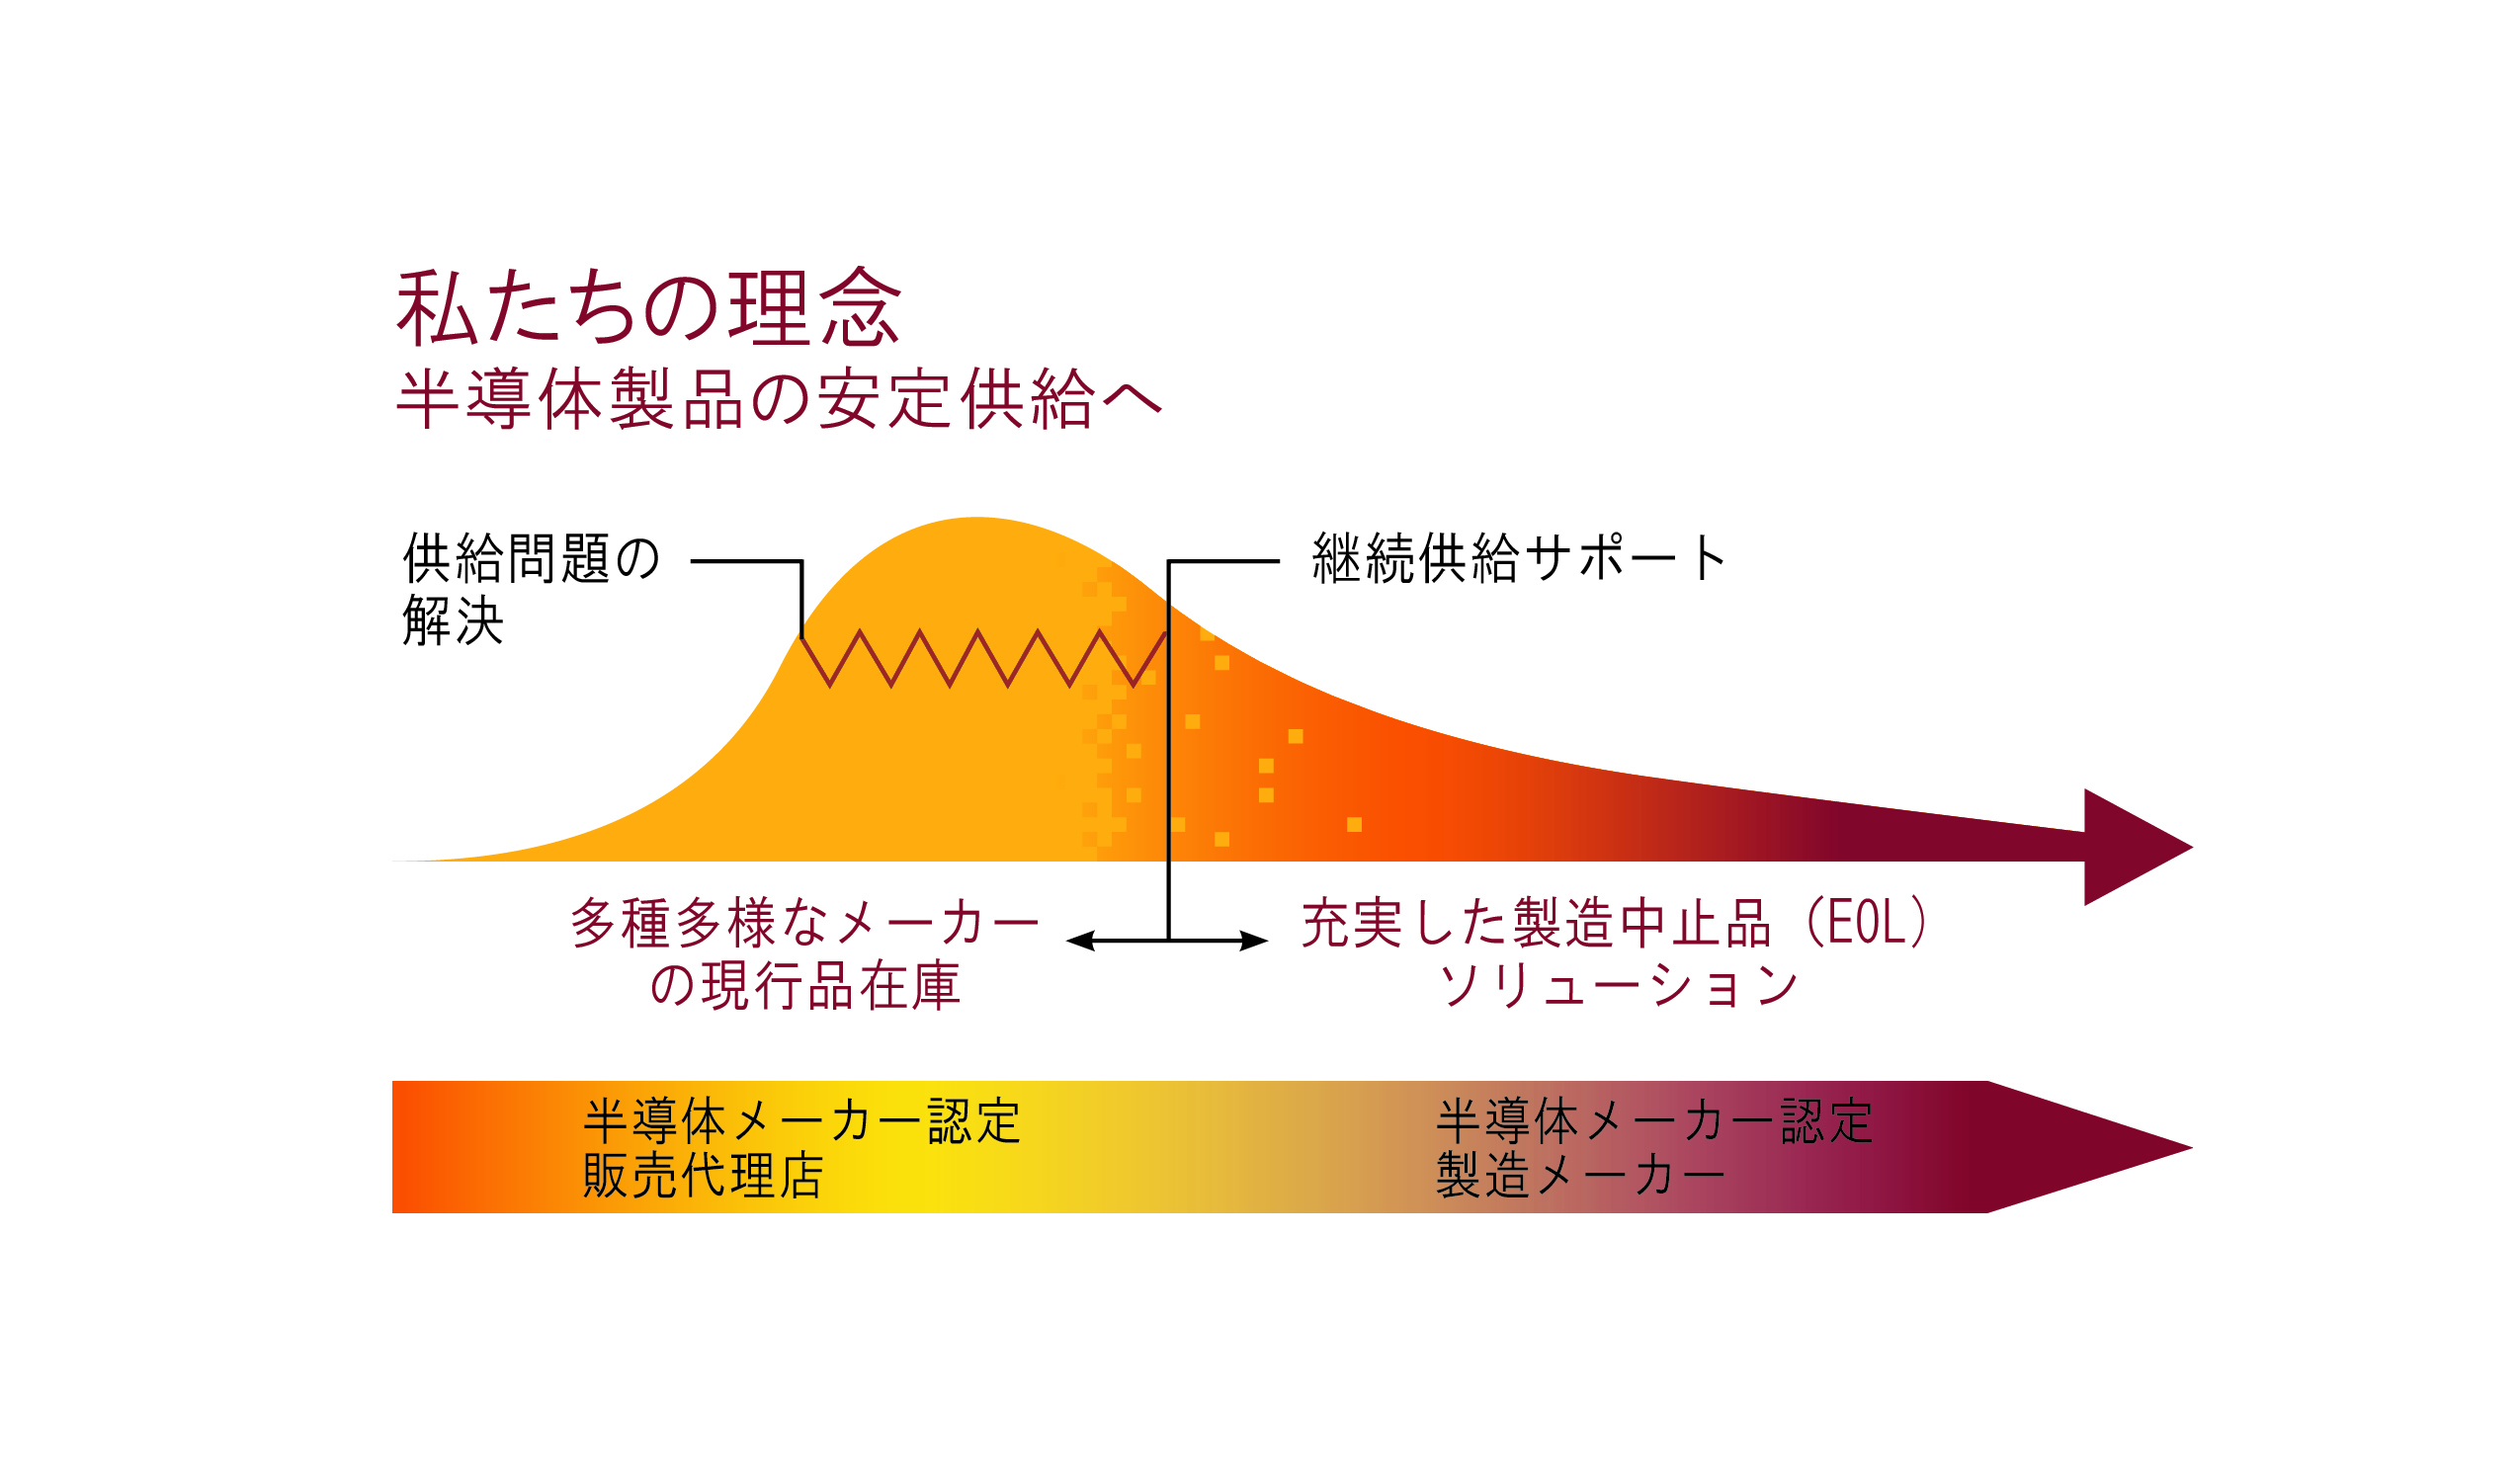 Life Cycle Graphic_21mar17_Japanese.jpg